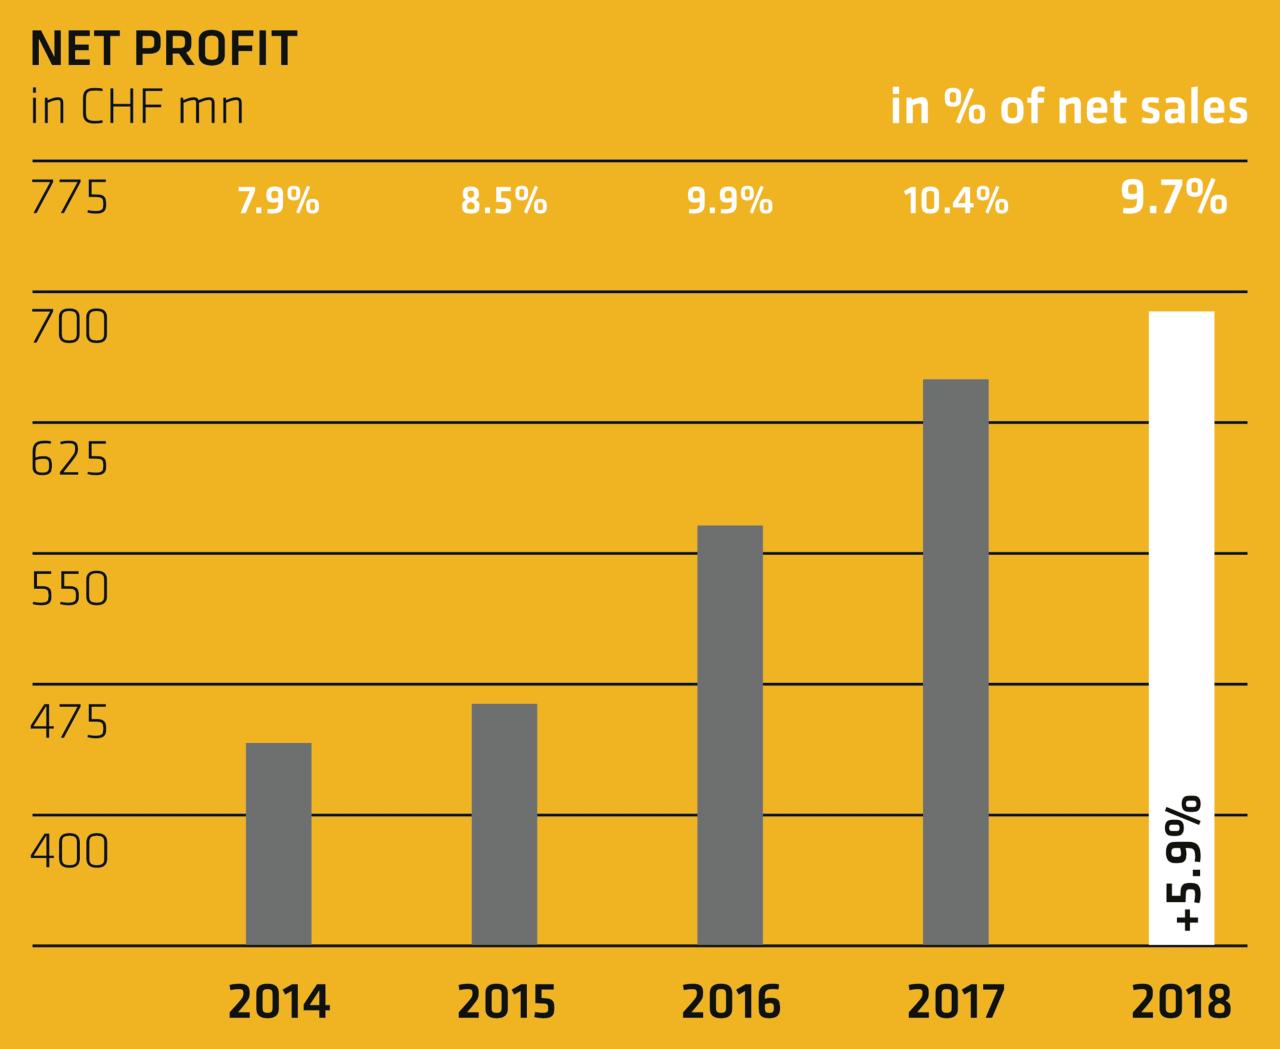 Net profit - Annual Report 2018